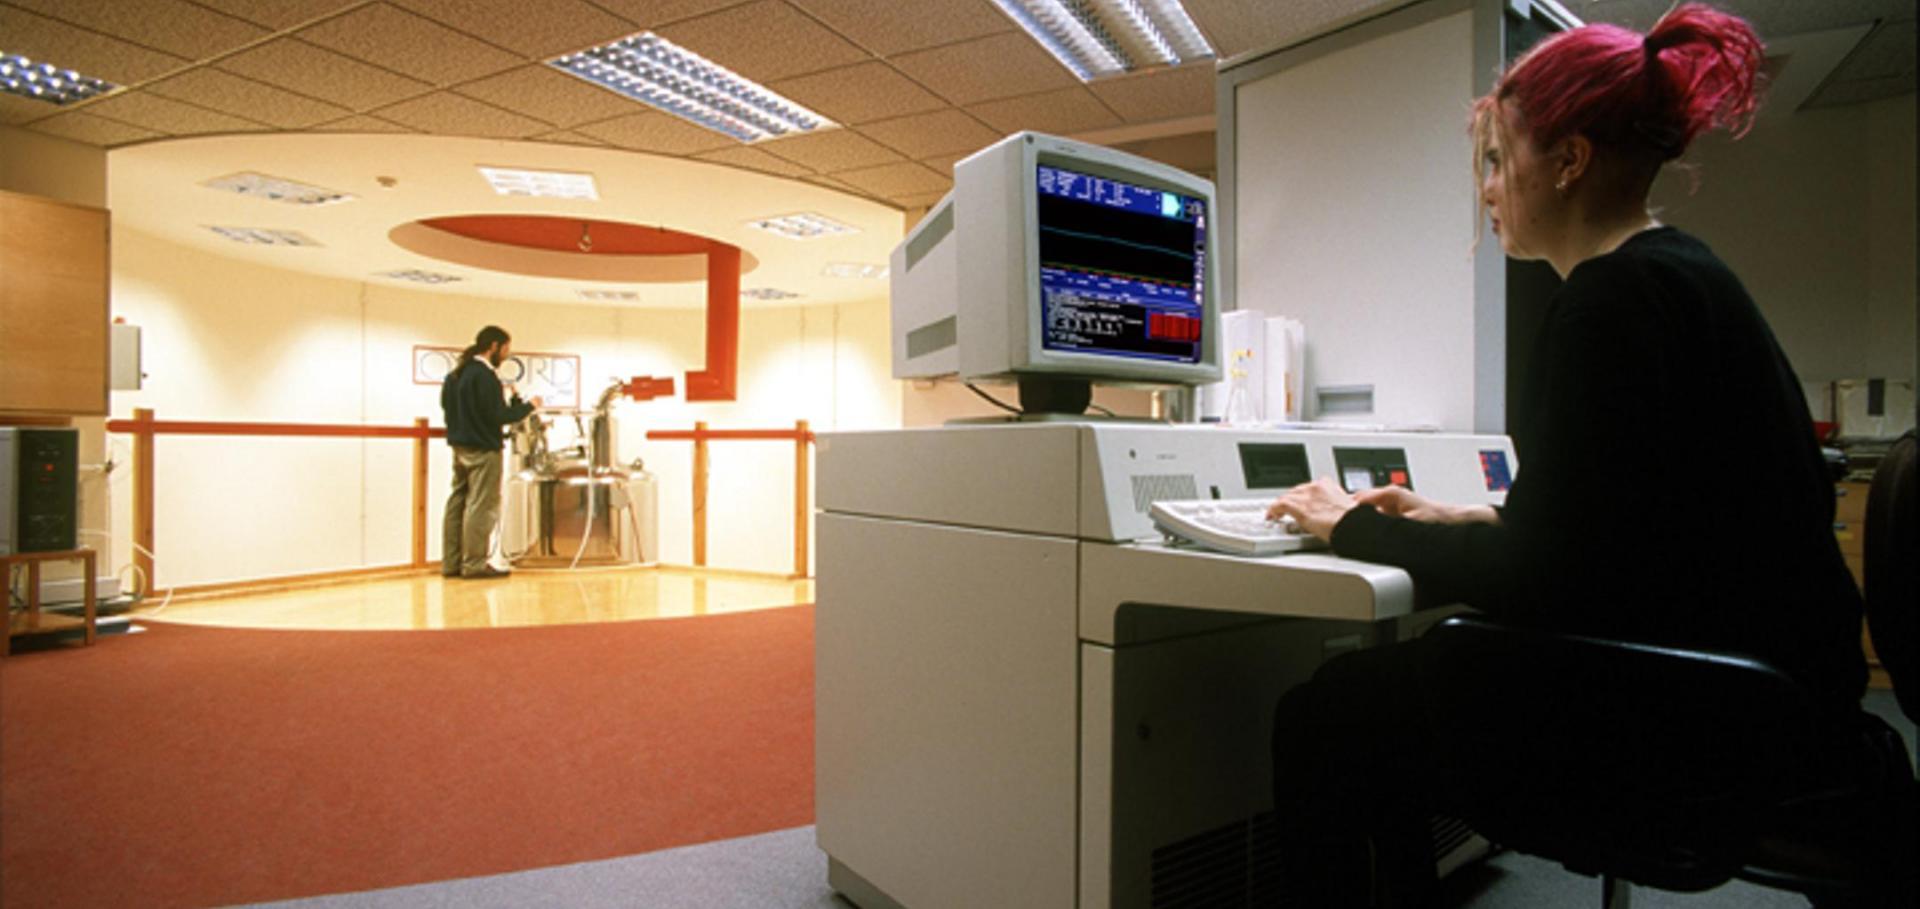 750MHZ NMR spectrometer